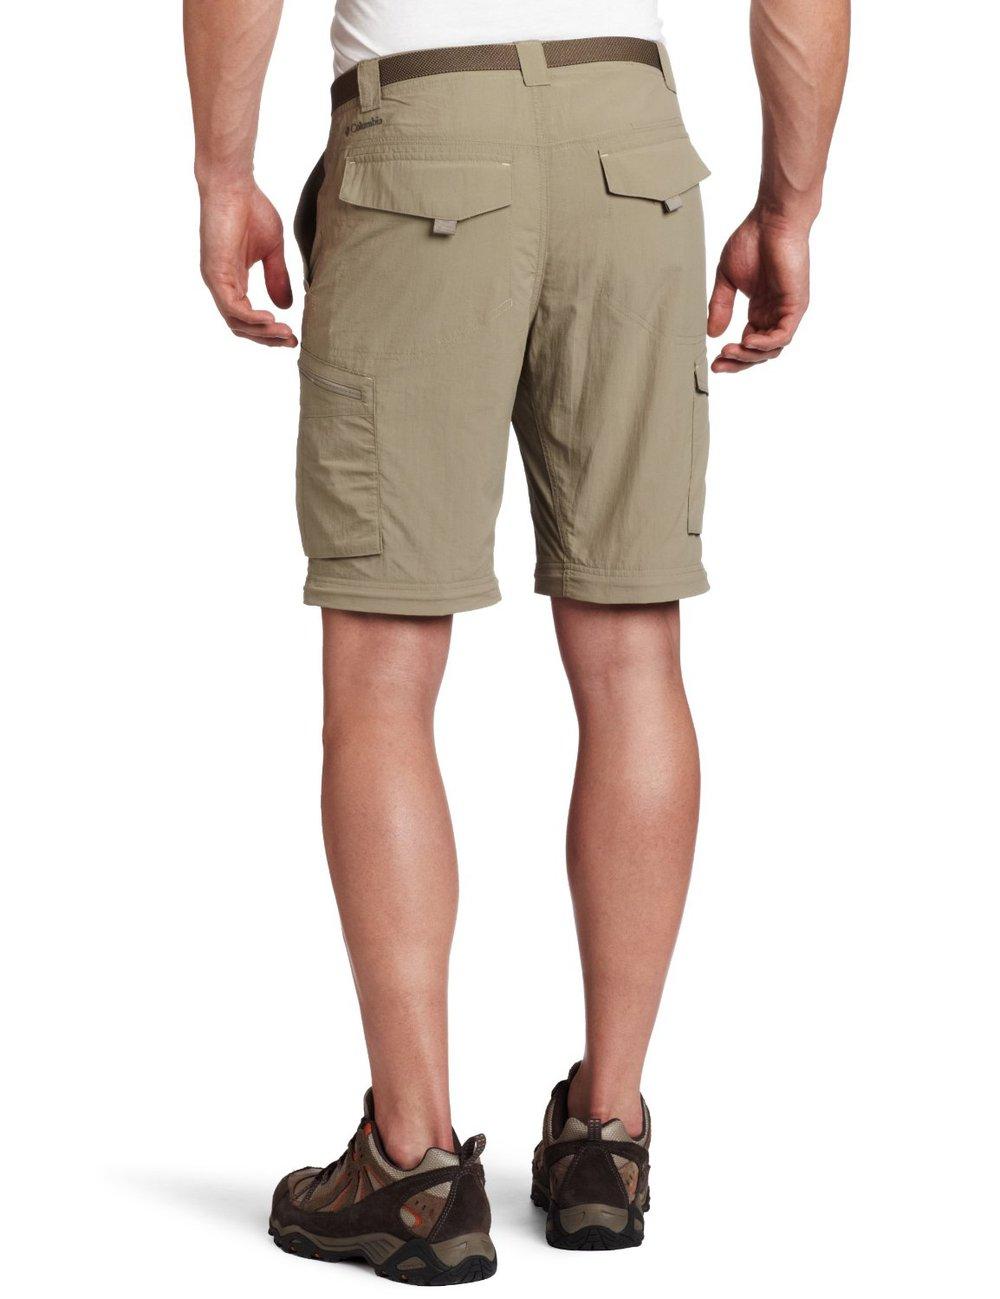 Plus size ripstop pants